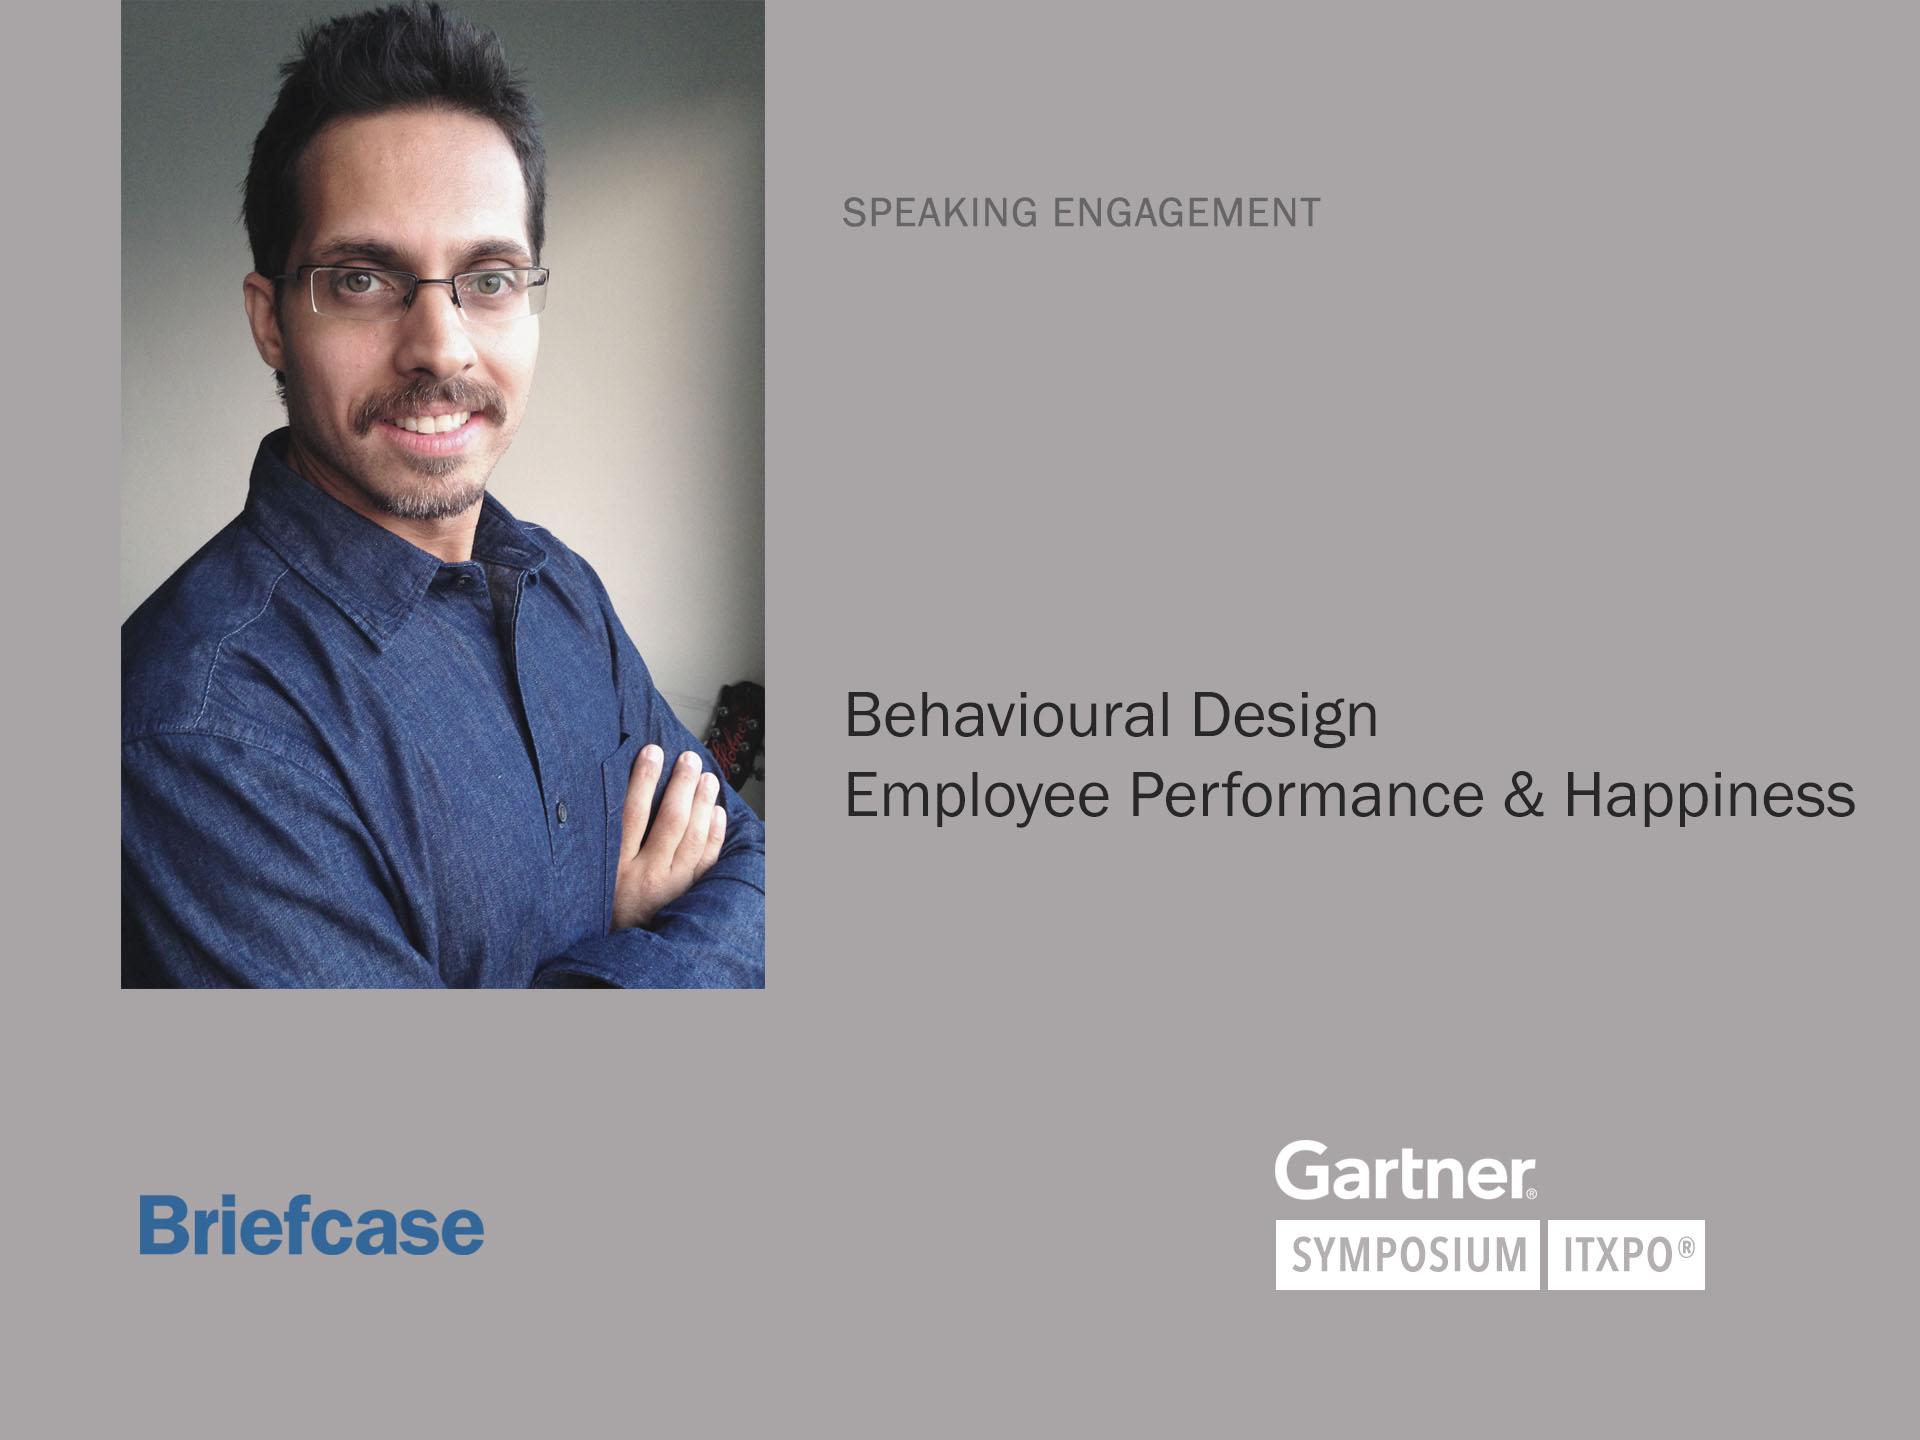 Employee performance and happiness talk (Gartner)